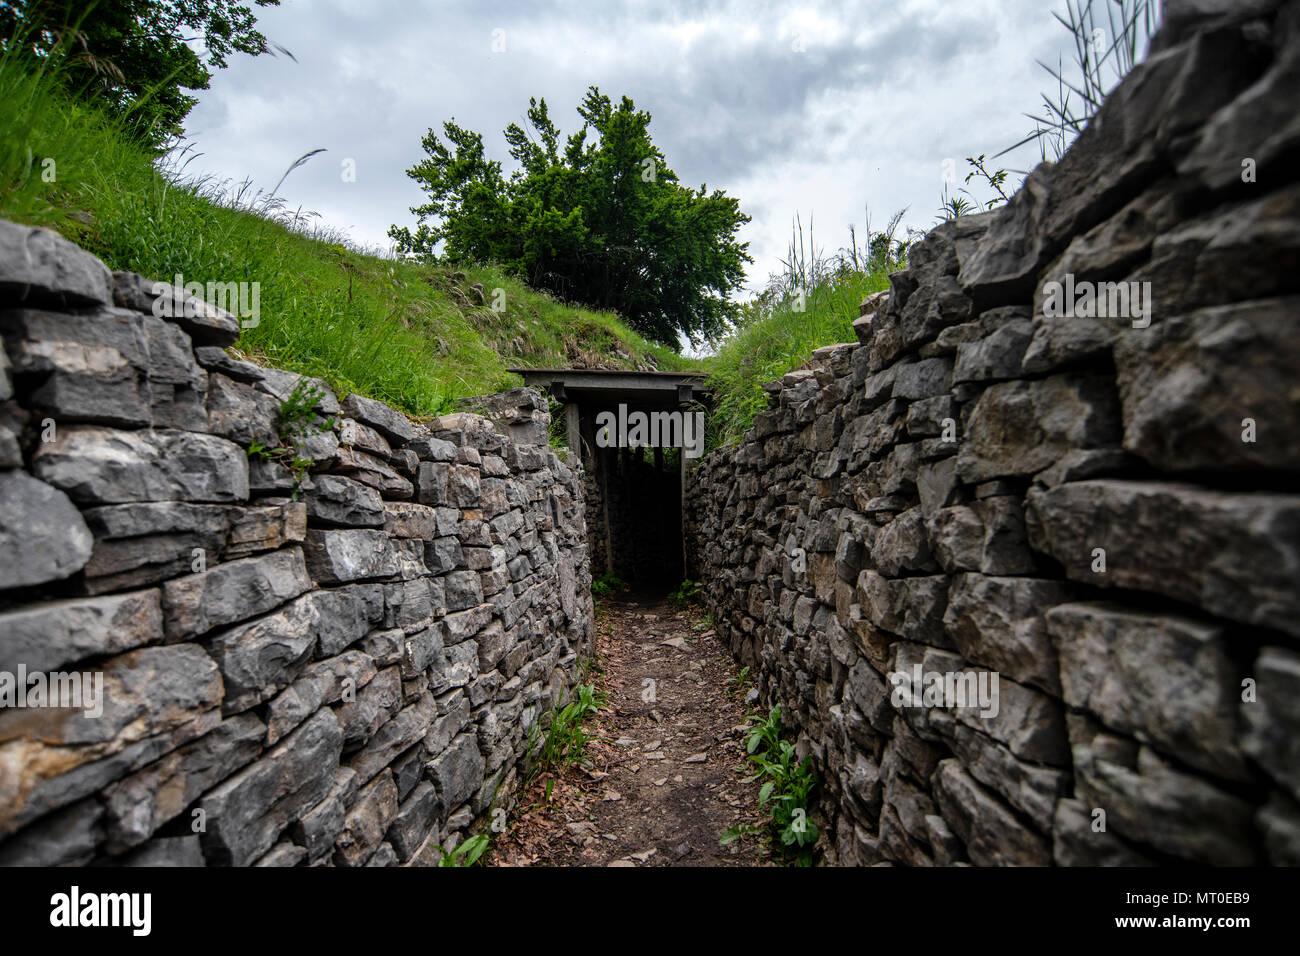 First World War Italian army fortifications and trenches between Na Gradu and Tinški vrh on the Kolovrat ridge on the Italian-Slovenian border. - Stock Image